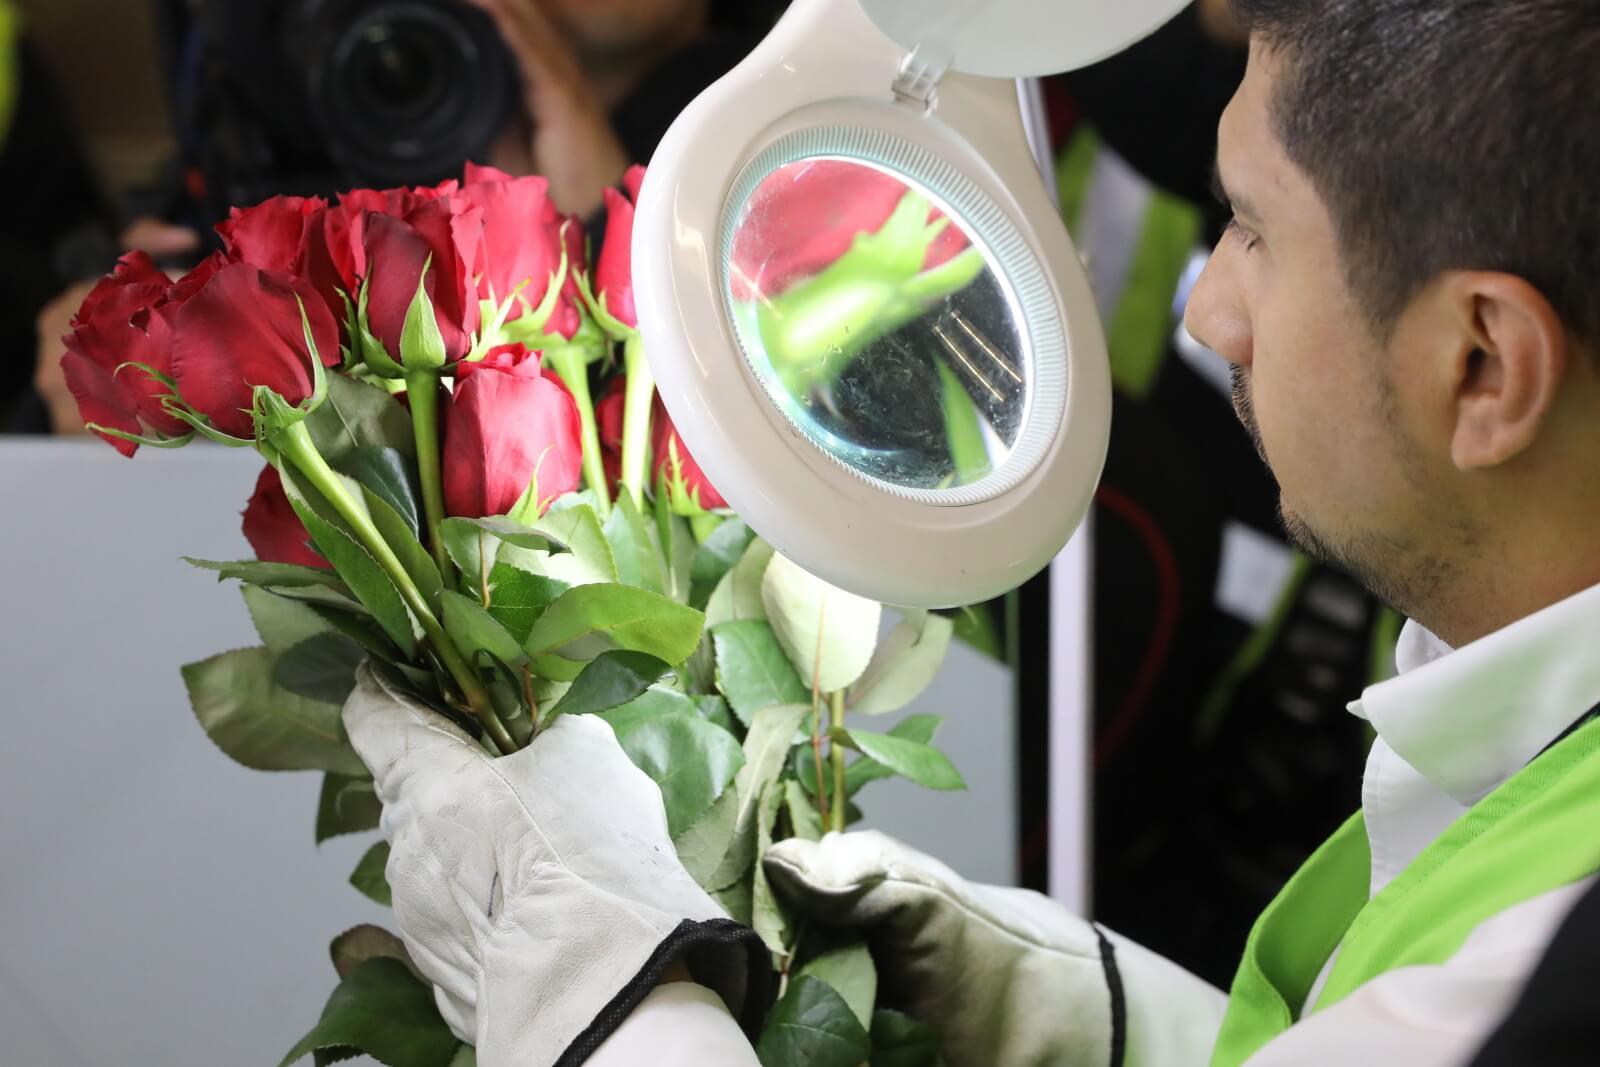 Eksport kwiatów z Kolumbii fot. EPA/Carlos Ortega